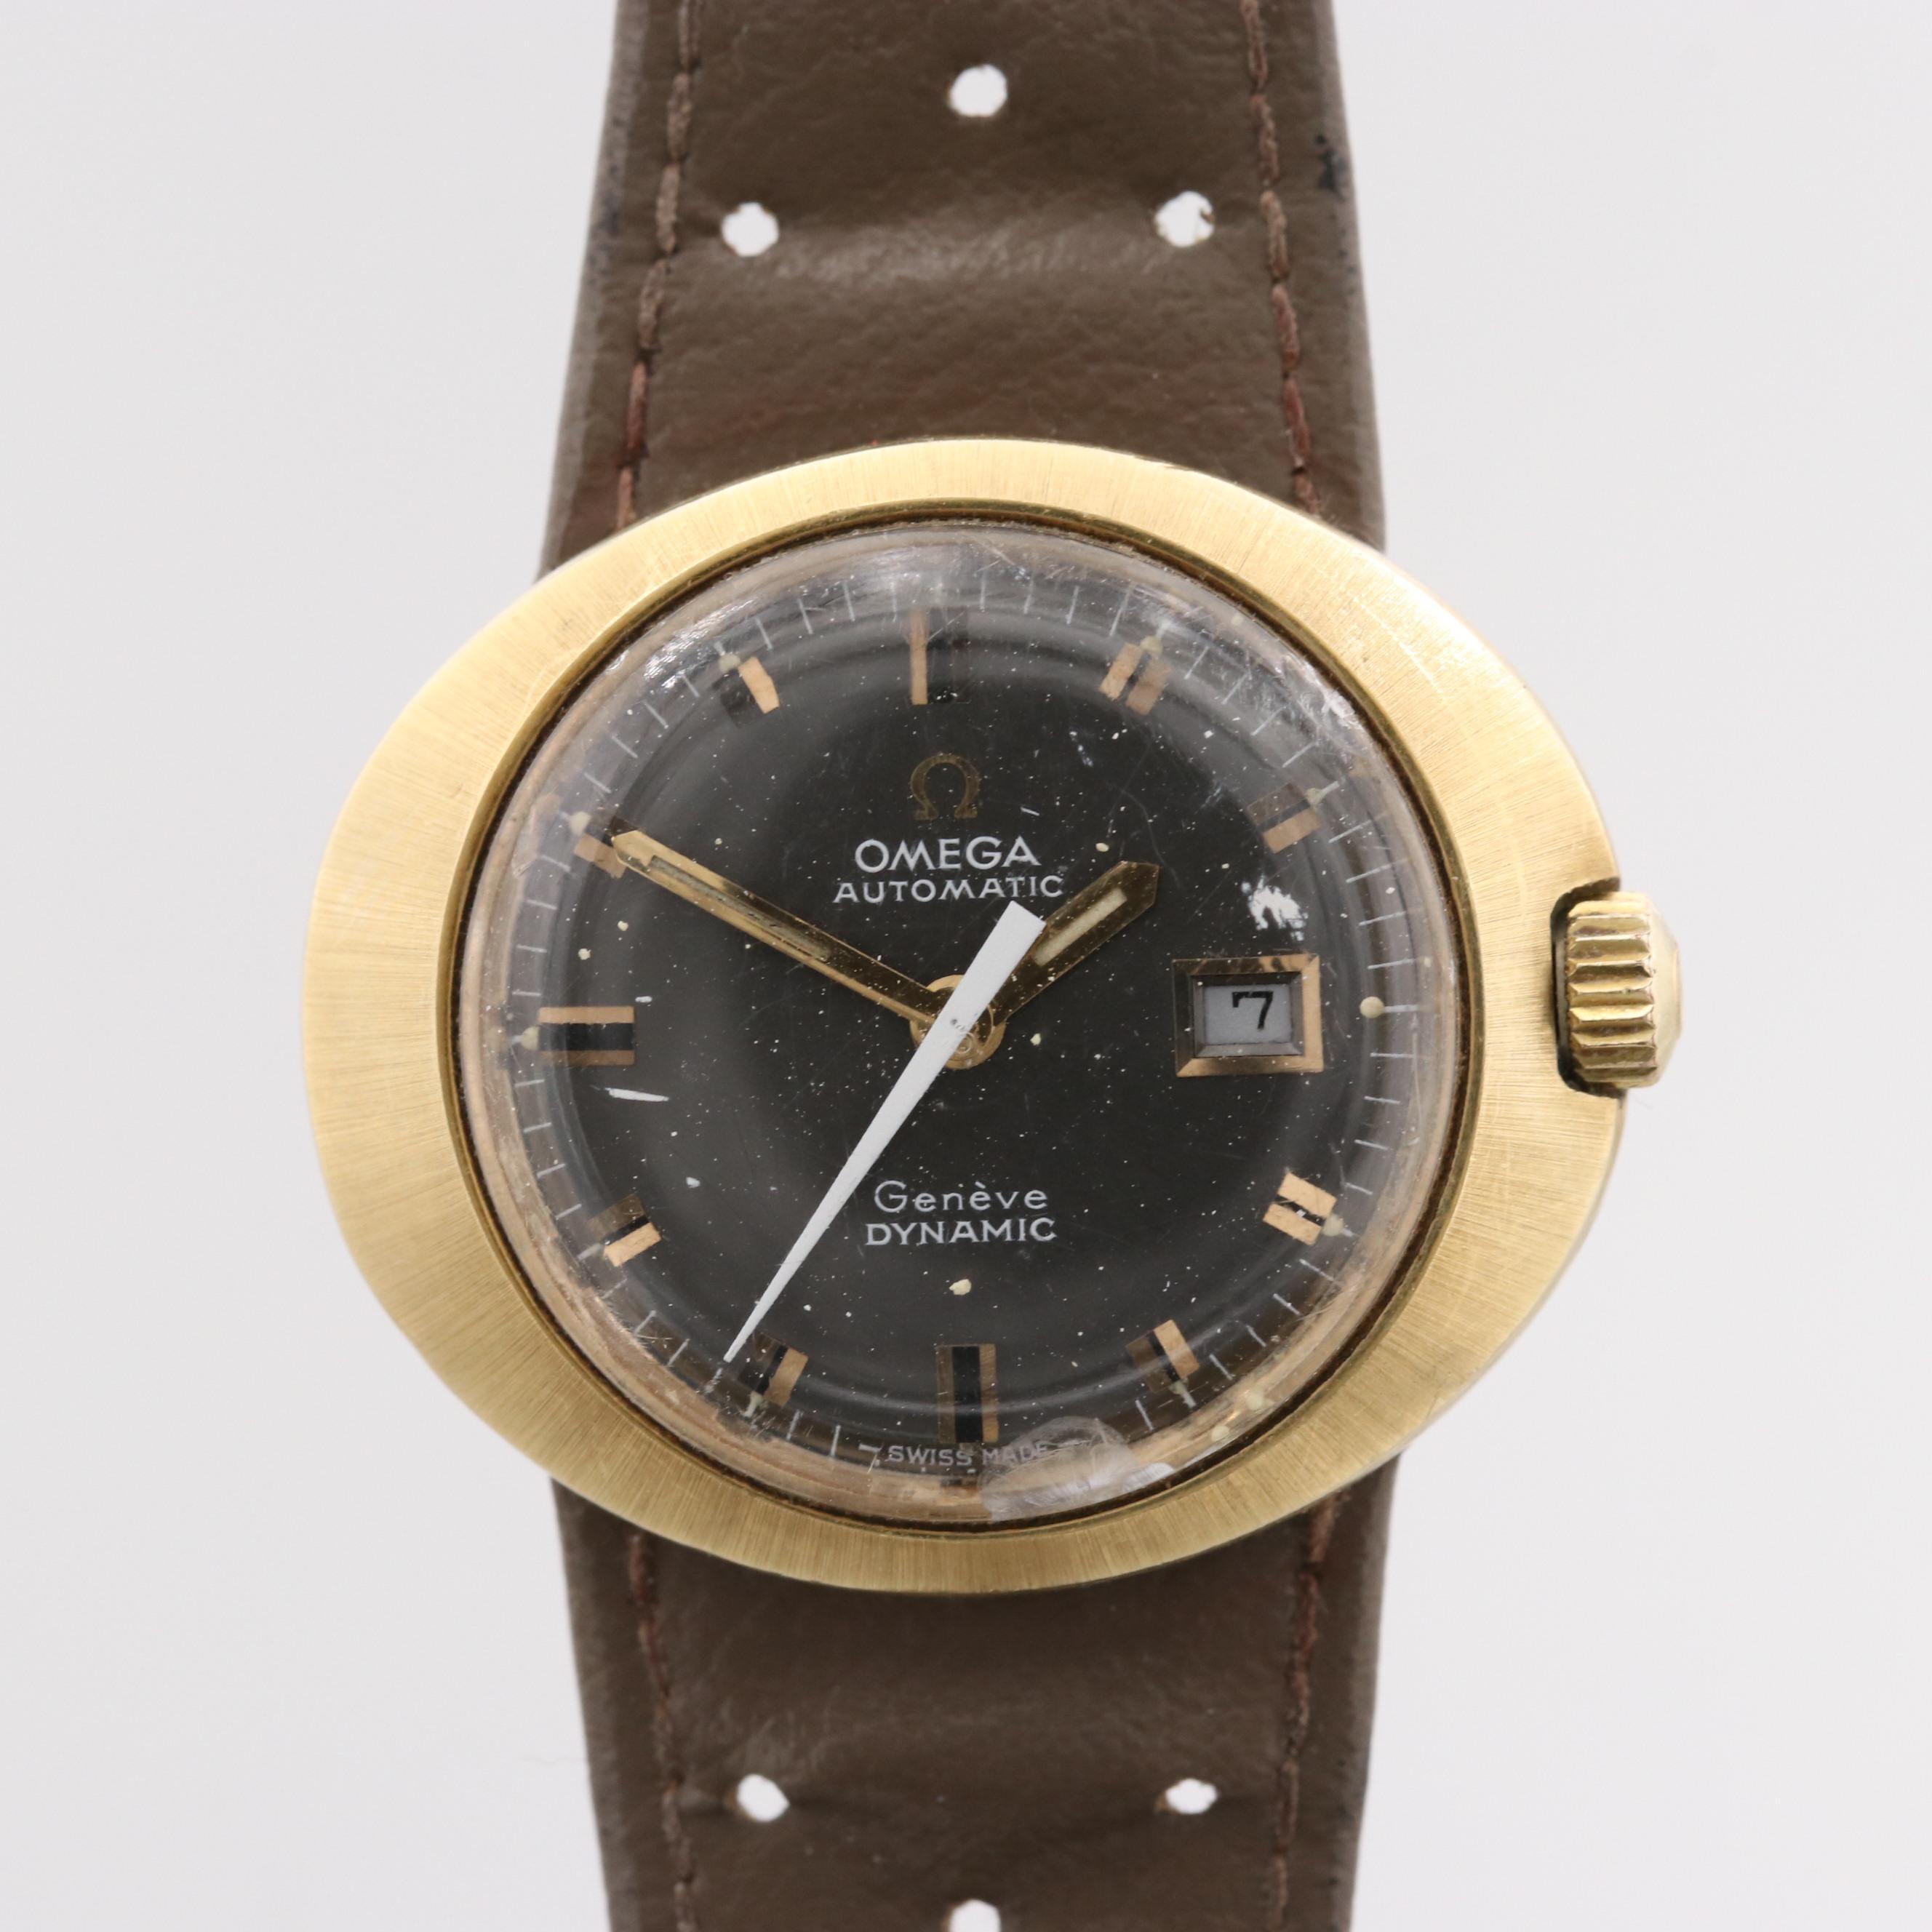 Omega Dynamic Automatic Wristwatch With Date Window